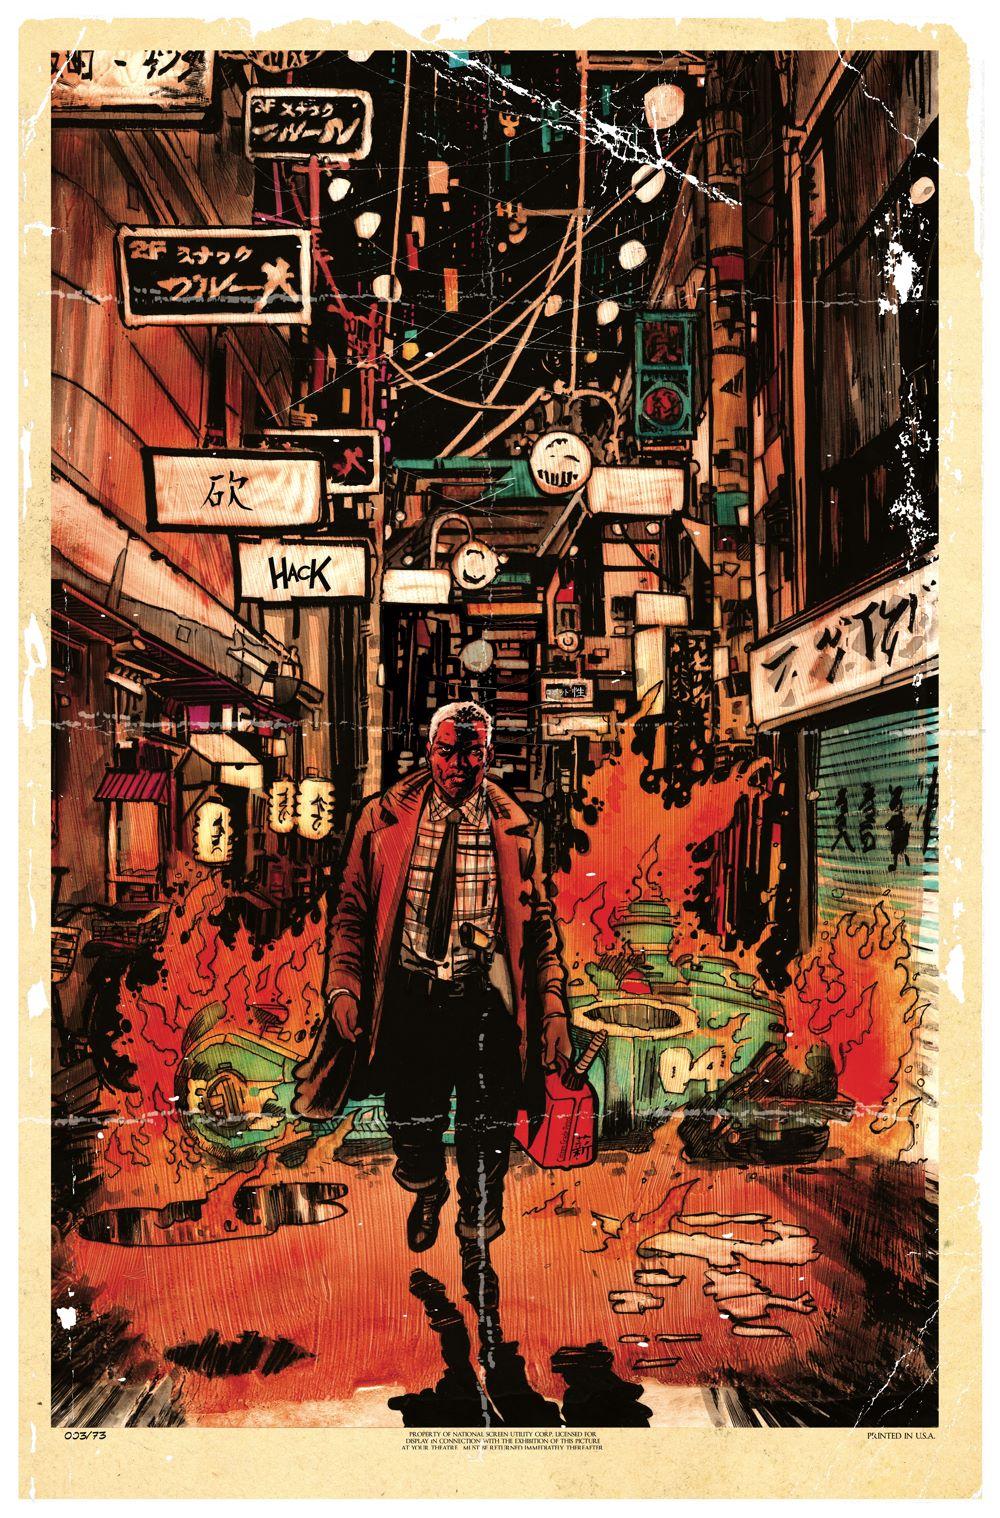 BladeRunnerOriginsHack3 Titan Comics July 2021 Solicitations